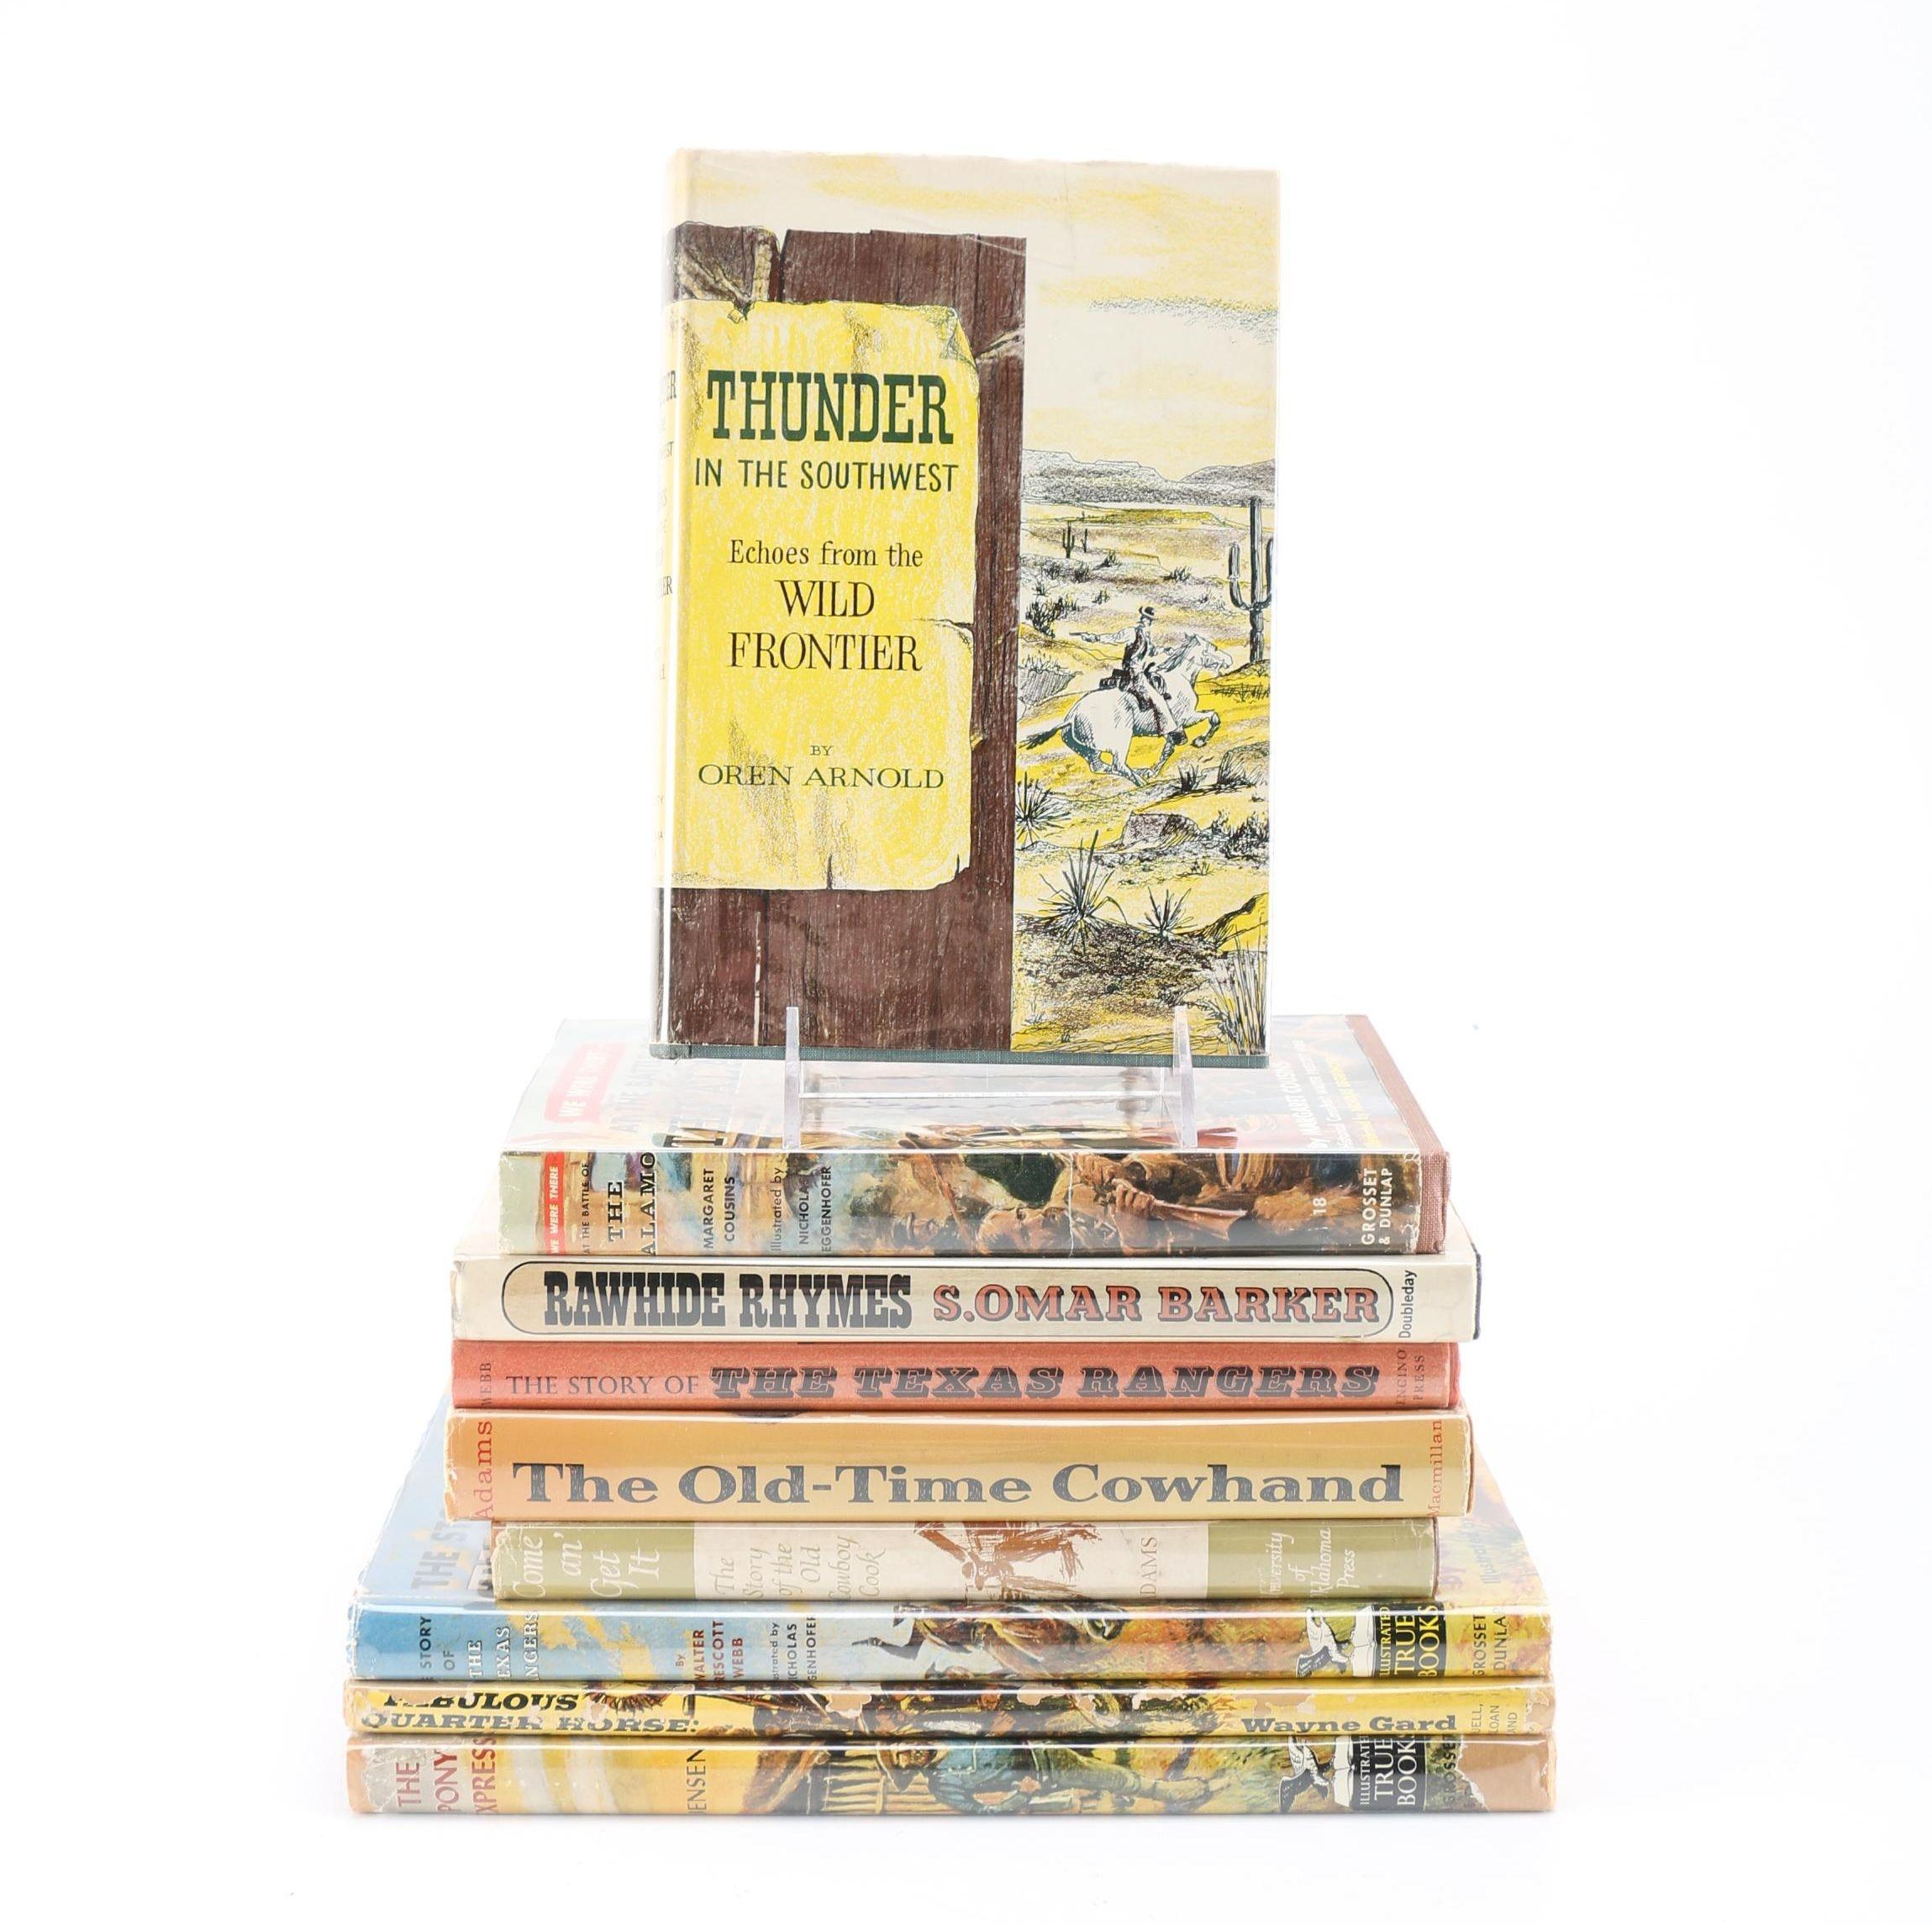 Eggenhoffer Illustrated Books Featuring Signed Copies